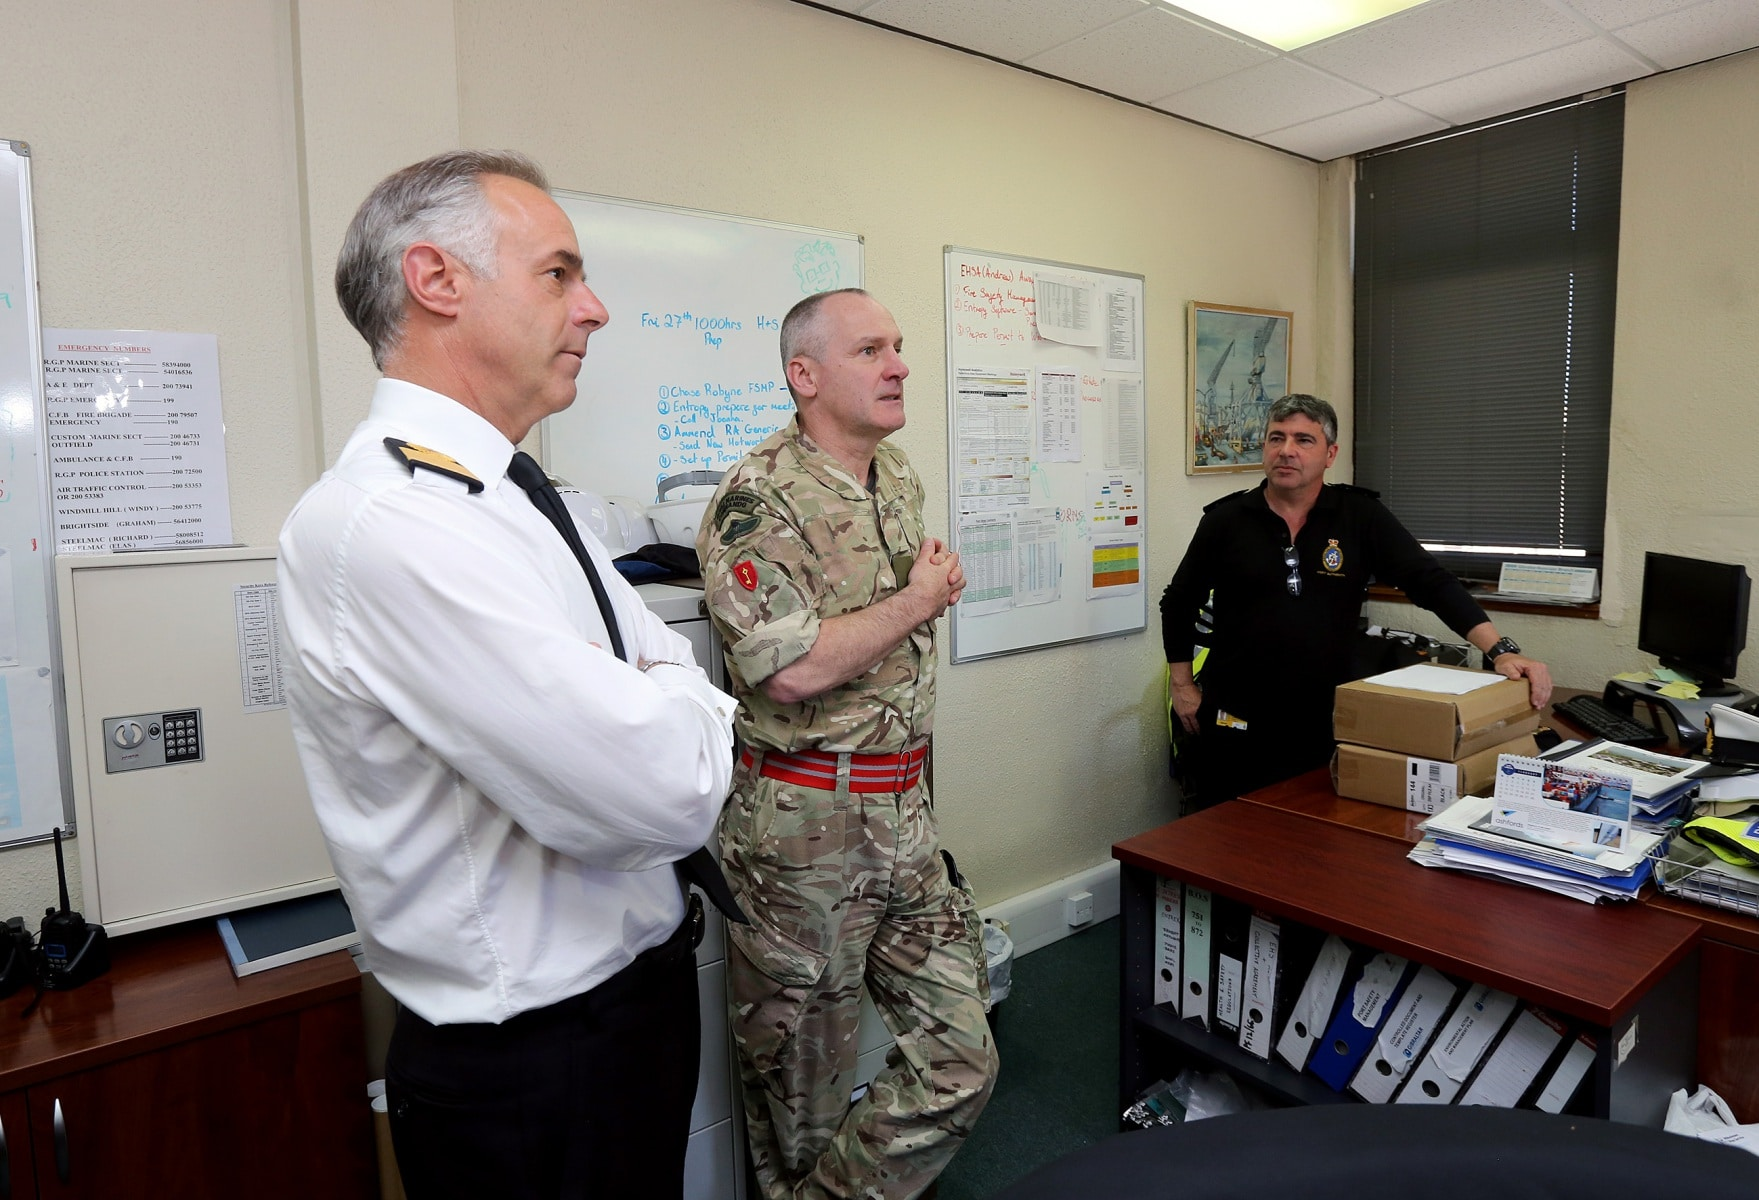 visita-oficial-del-gobernador-al-puerto-de-gibraltar_26154508235_o